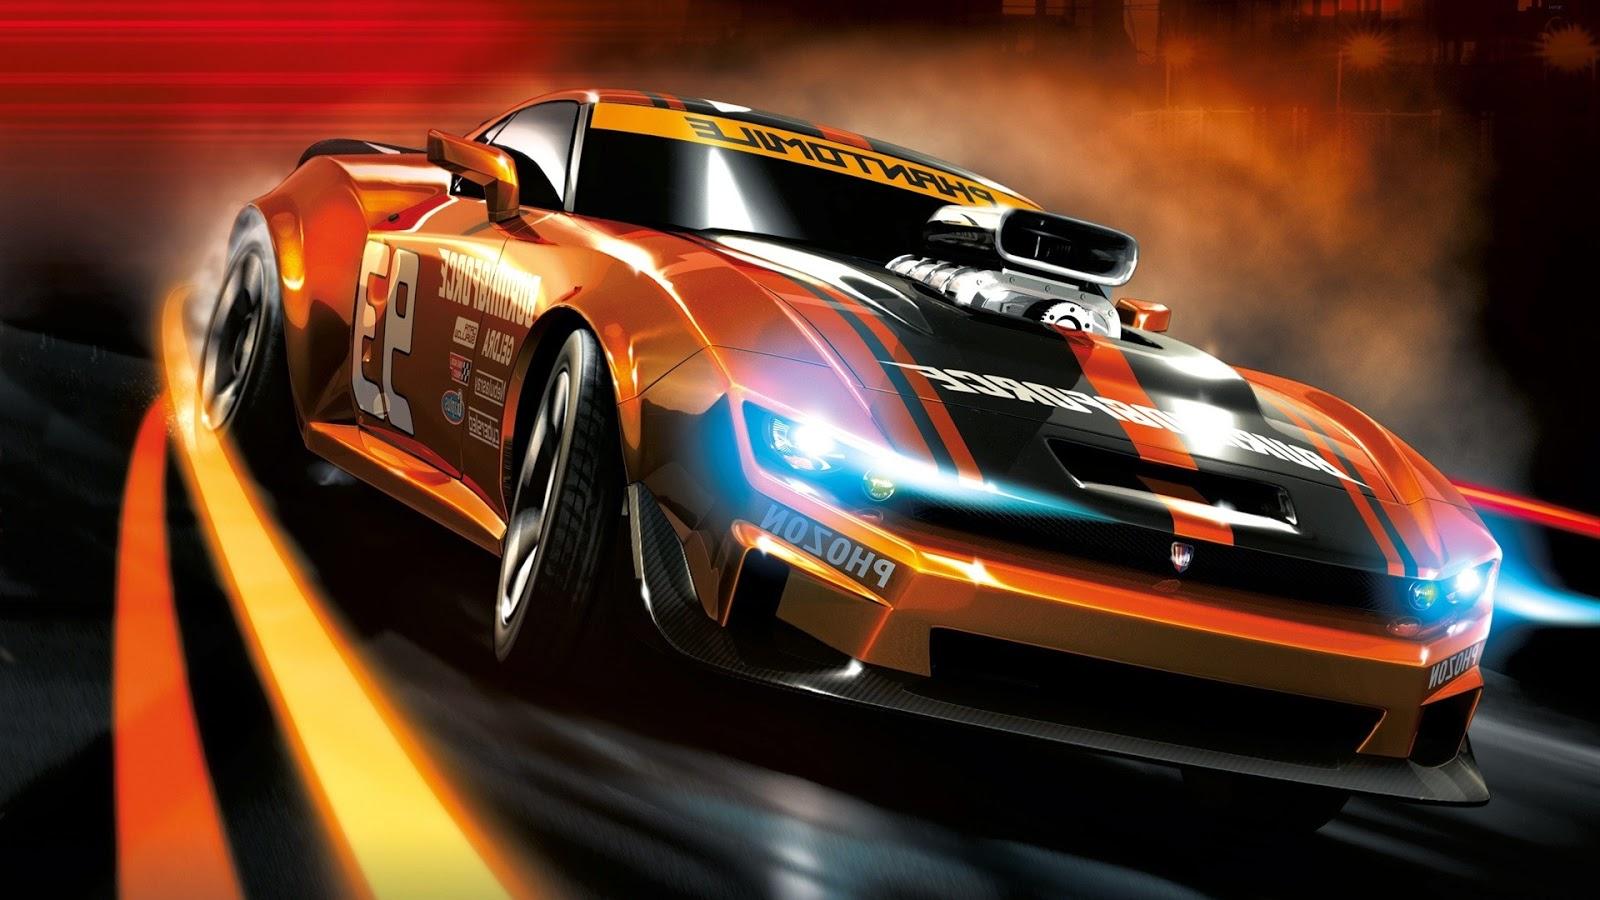 Gambar Mobil Balap Drag Paling Keren Cool Race Car Wallpapers 1600x900